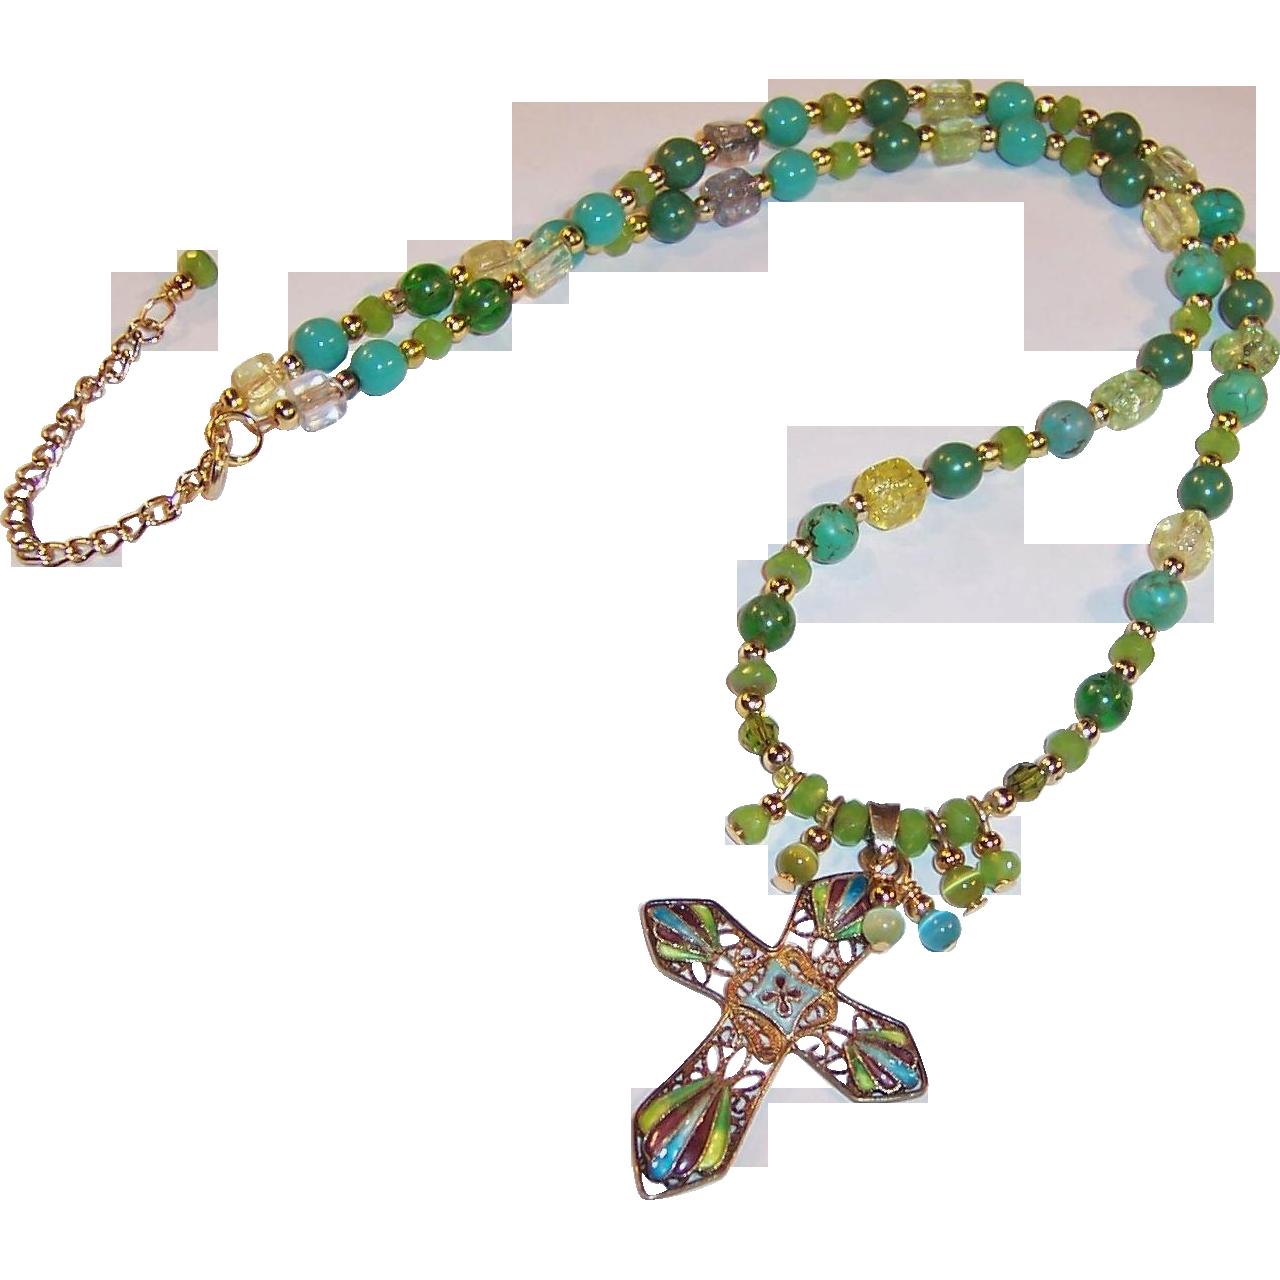 Vintage Enameled Vermeil Cross Pendant Artisan Necklace